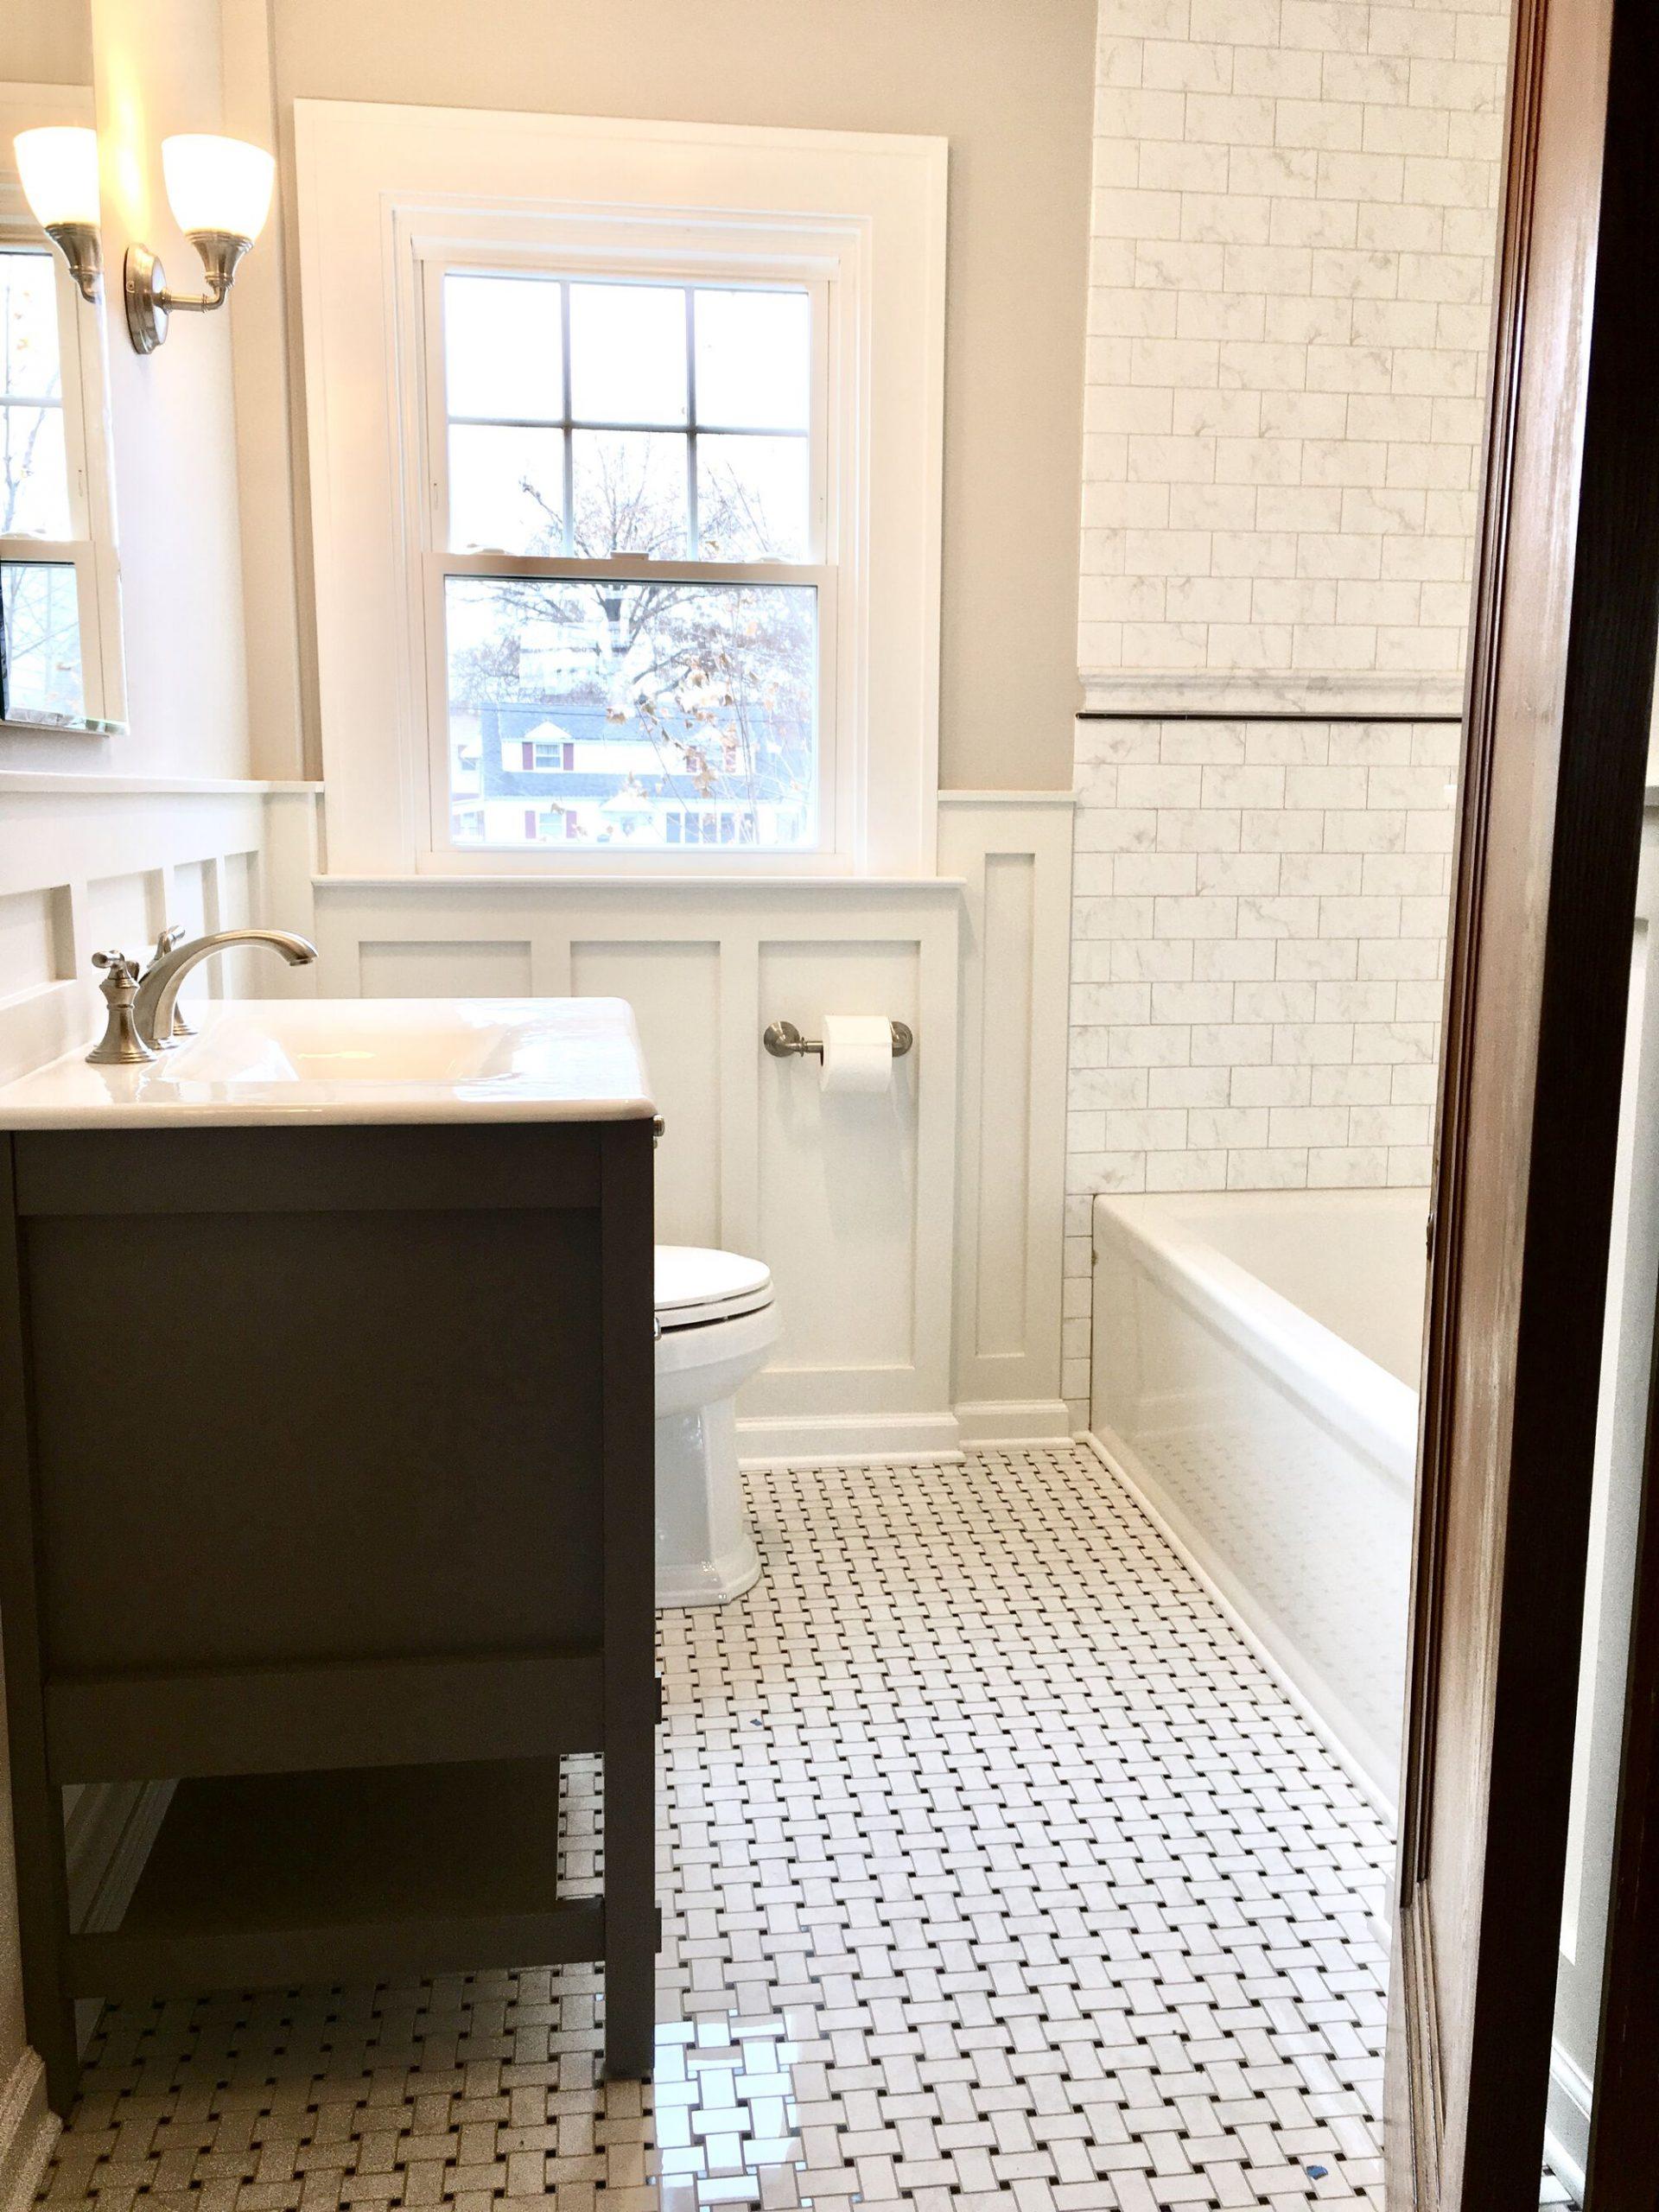 Retro Bath with Kohler Cabinetry, Porcelain Tile, MDF Wainscott Walls in Clifton, Essex County NJ